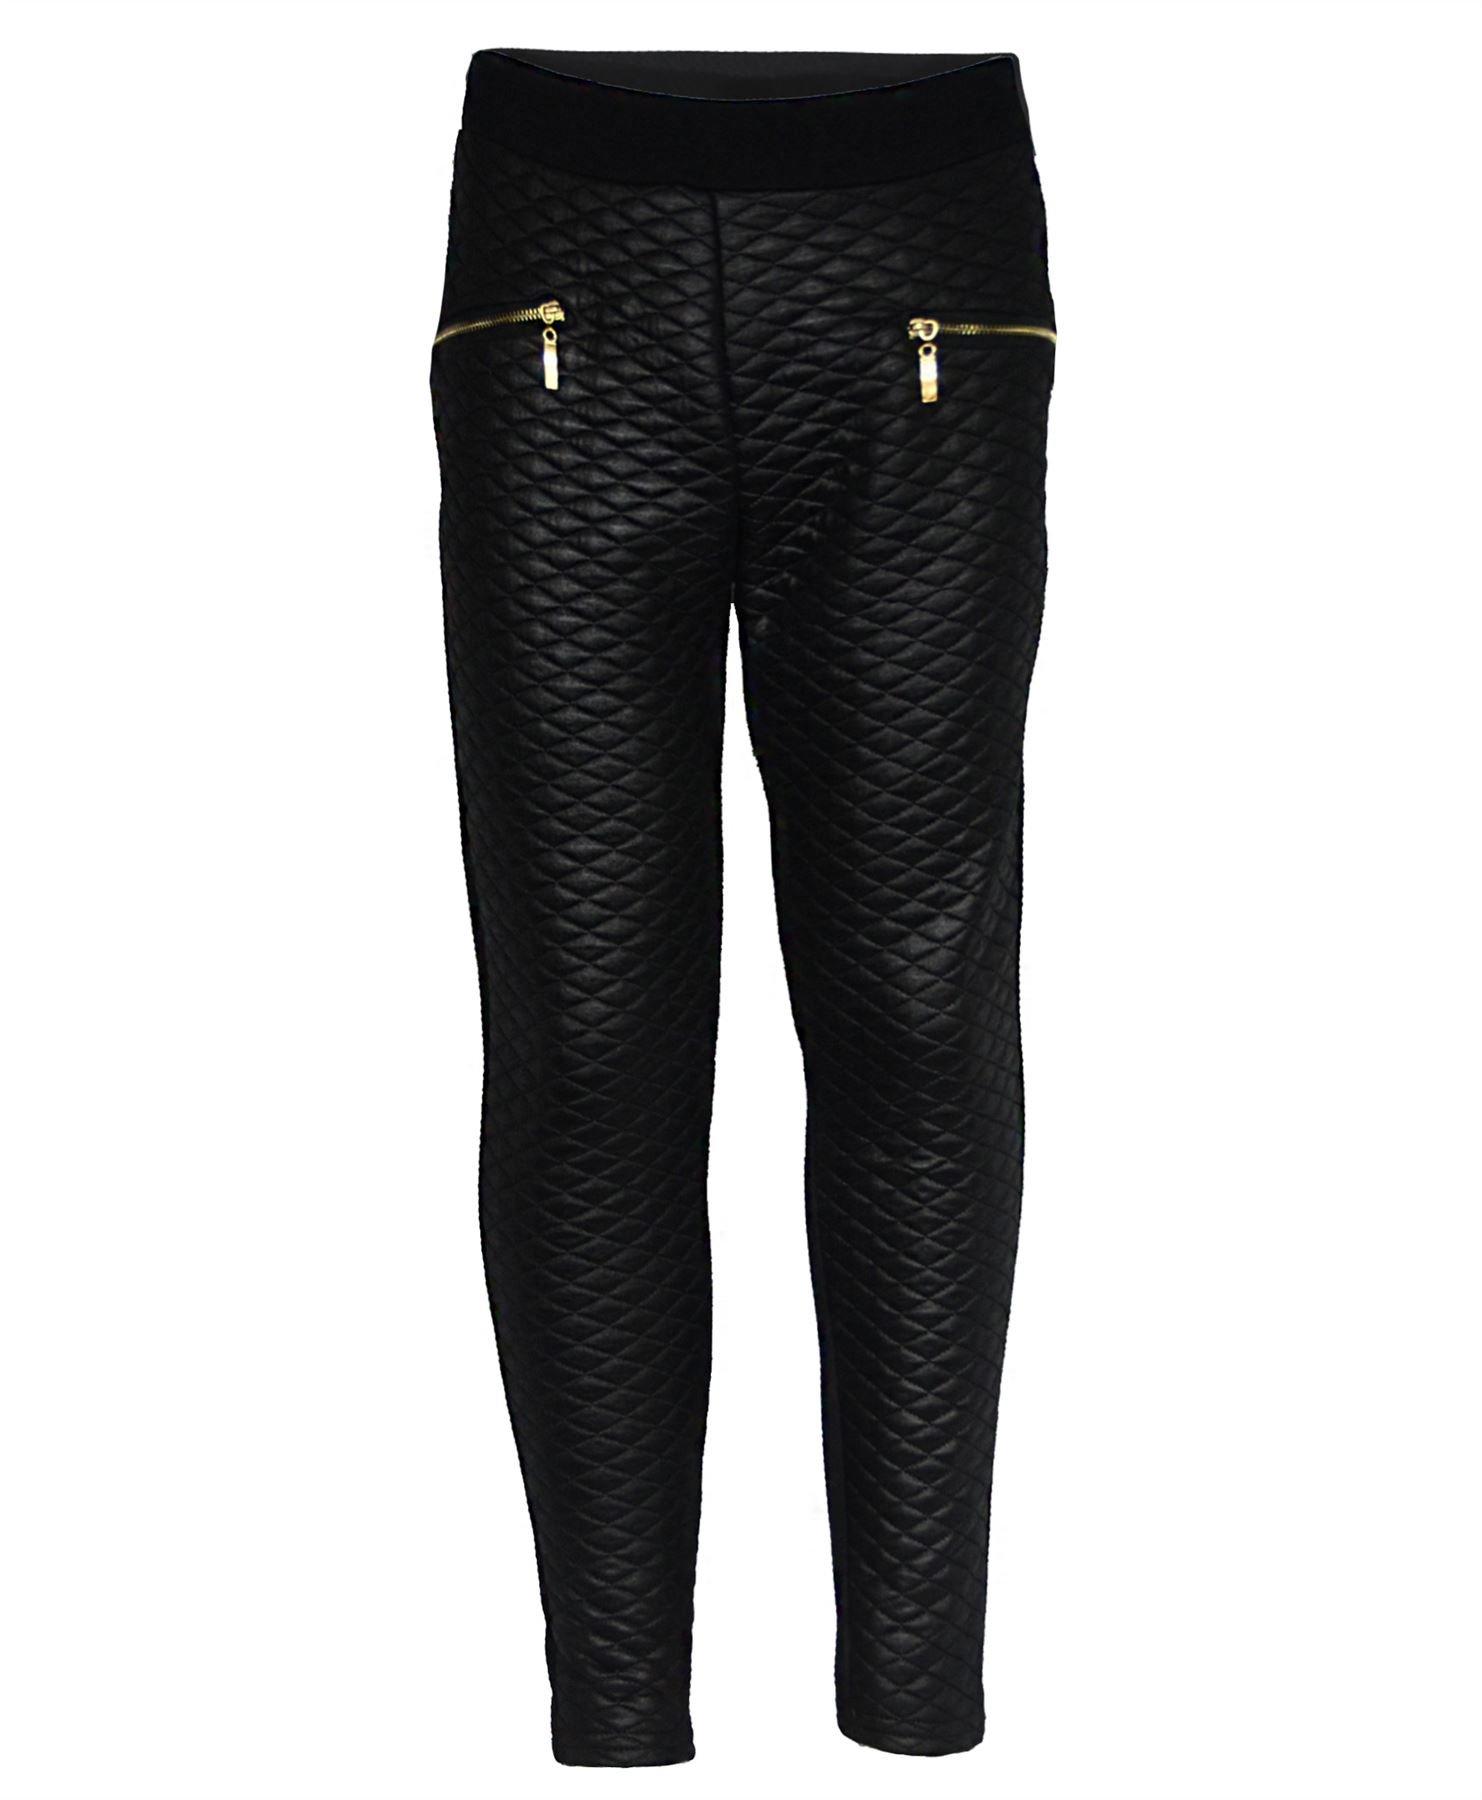 LotMart Girls Blazer Bundle Textured Leggings Style 3 in Mint Black 5-6 Y by LotMart (Image #3)